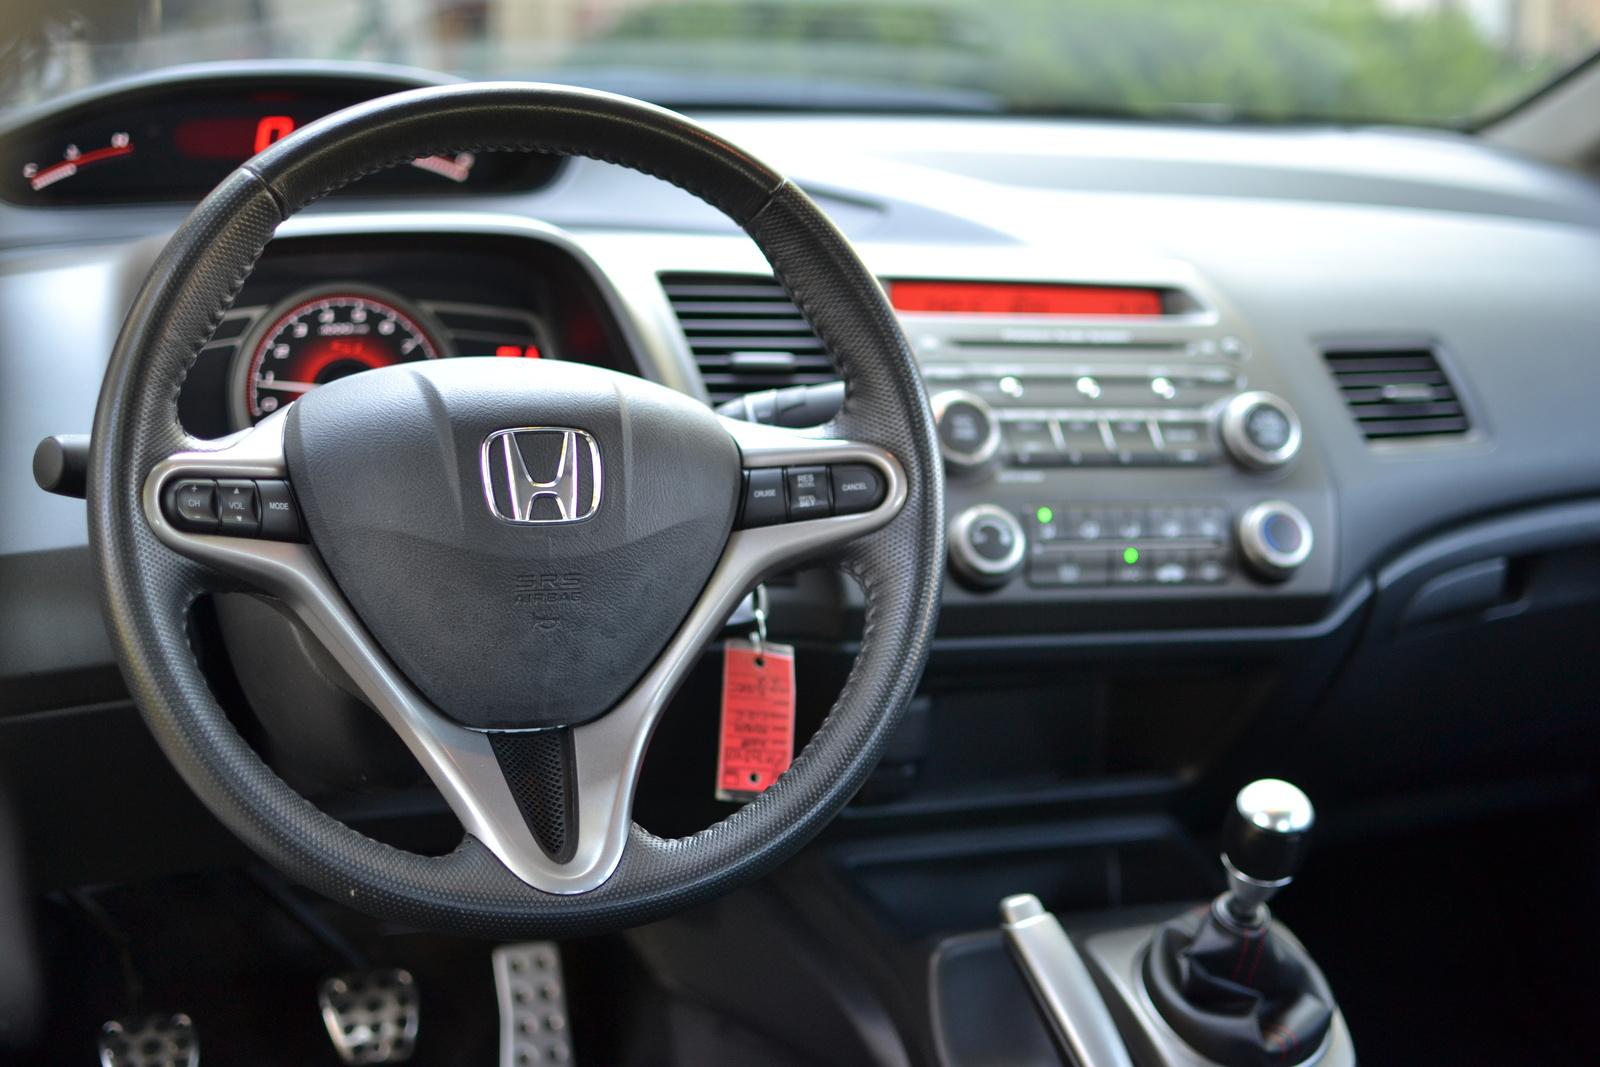 2008 Honda Civic Si Interior Parts Wroc Awski Informator Internetowy Wroc Aw Wroclaw